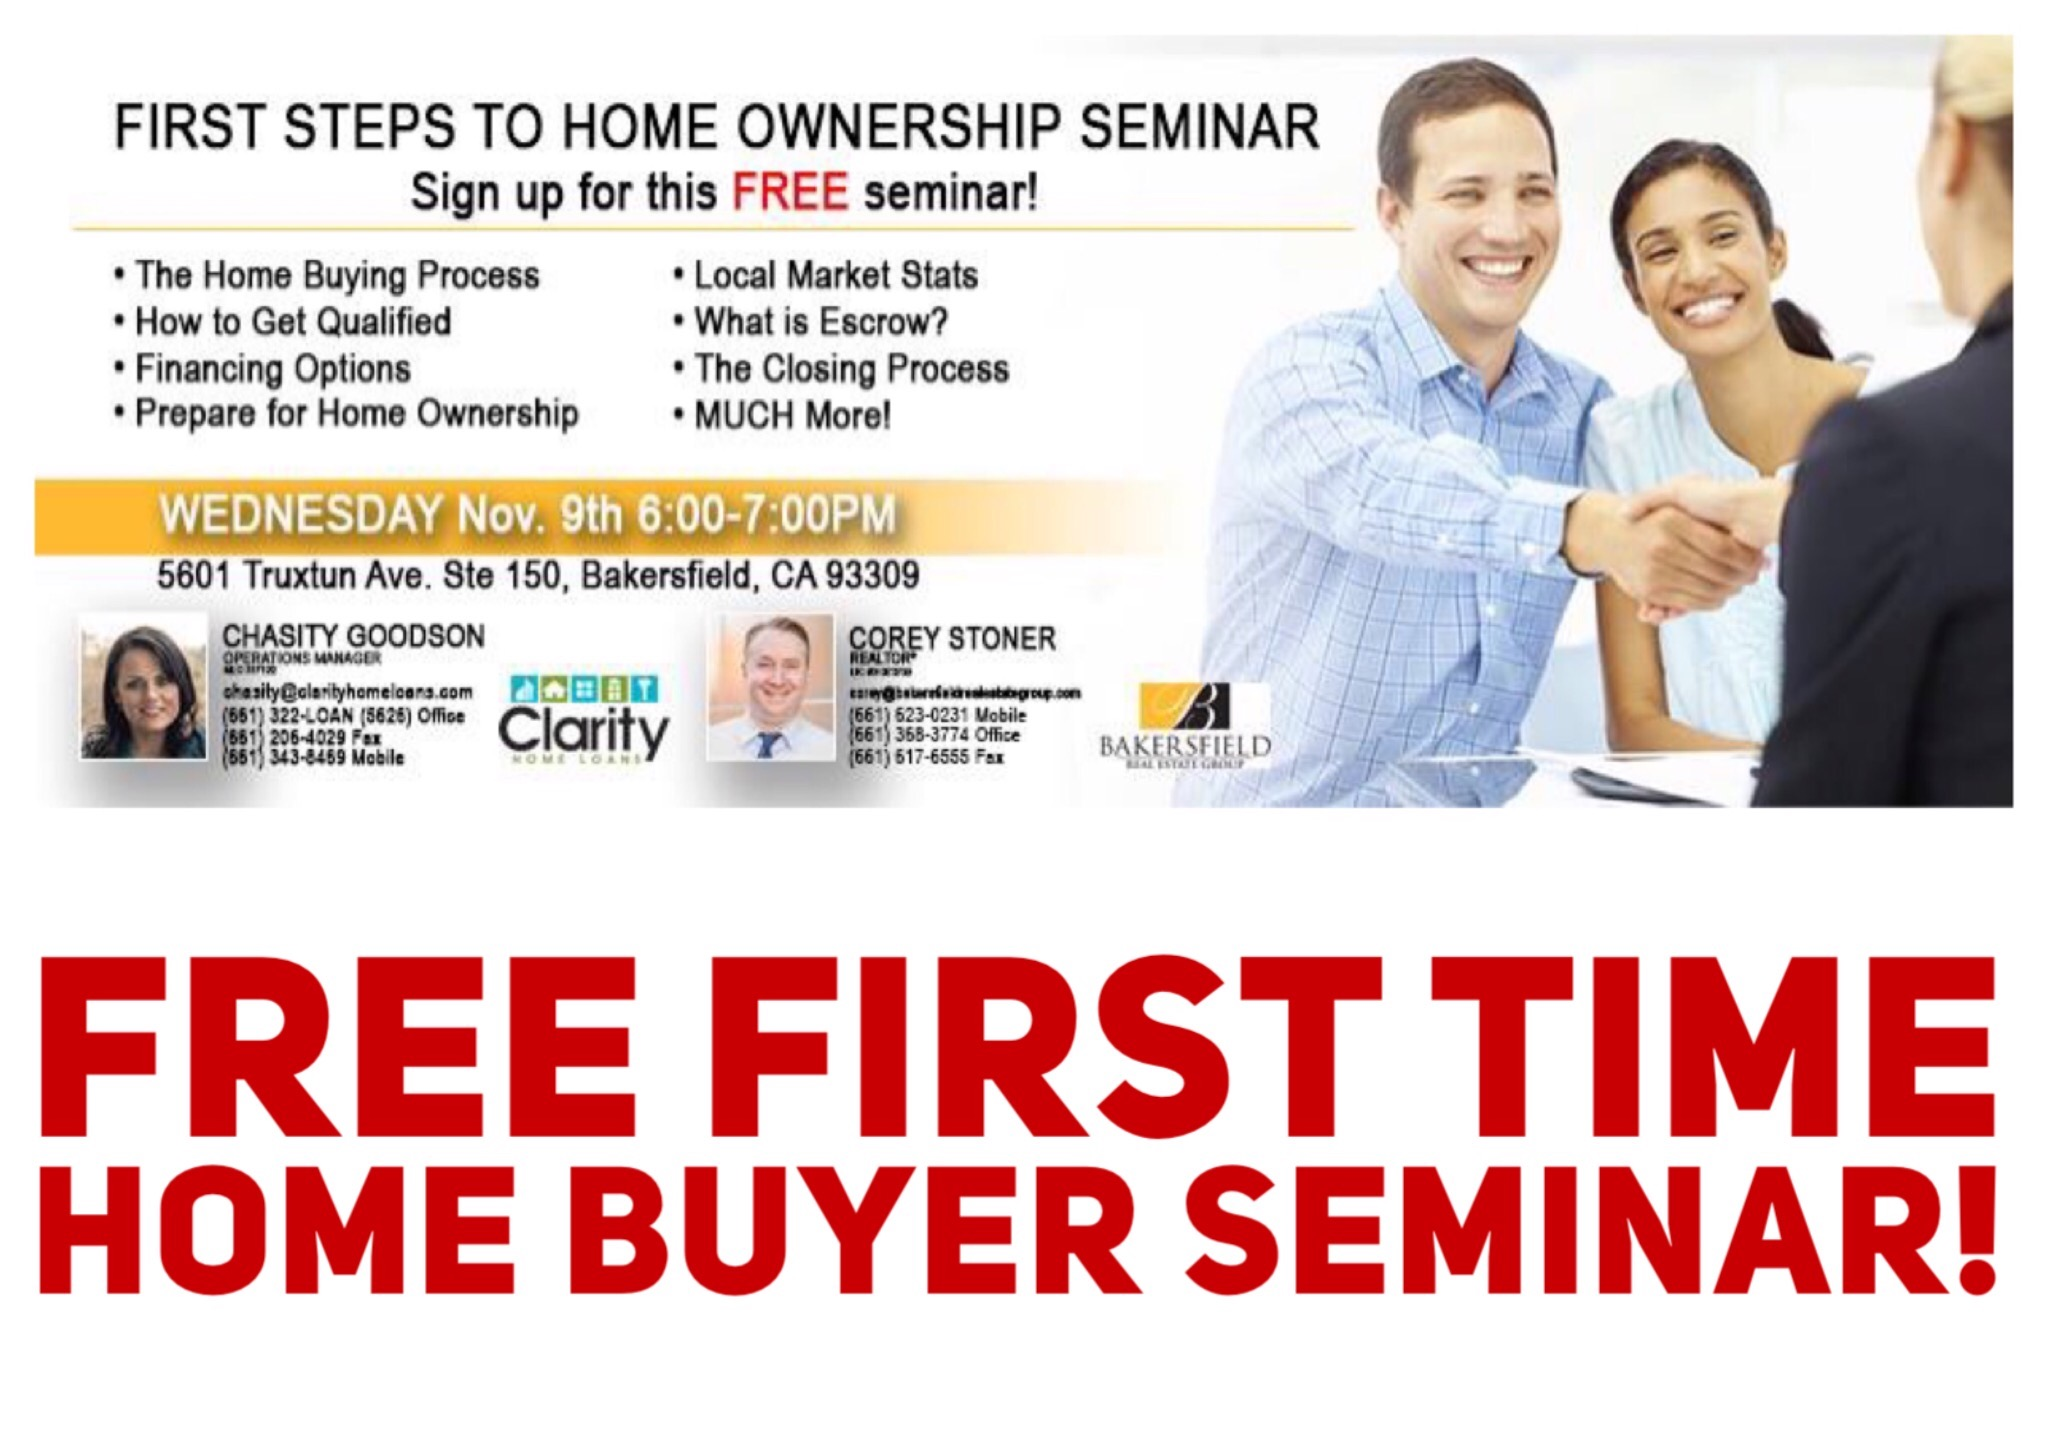 Best Realtor in Bakersfield - Offering a FREE Home Buyer Seminar! 661-704-4244